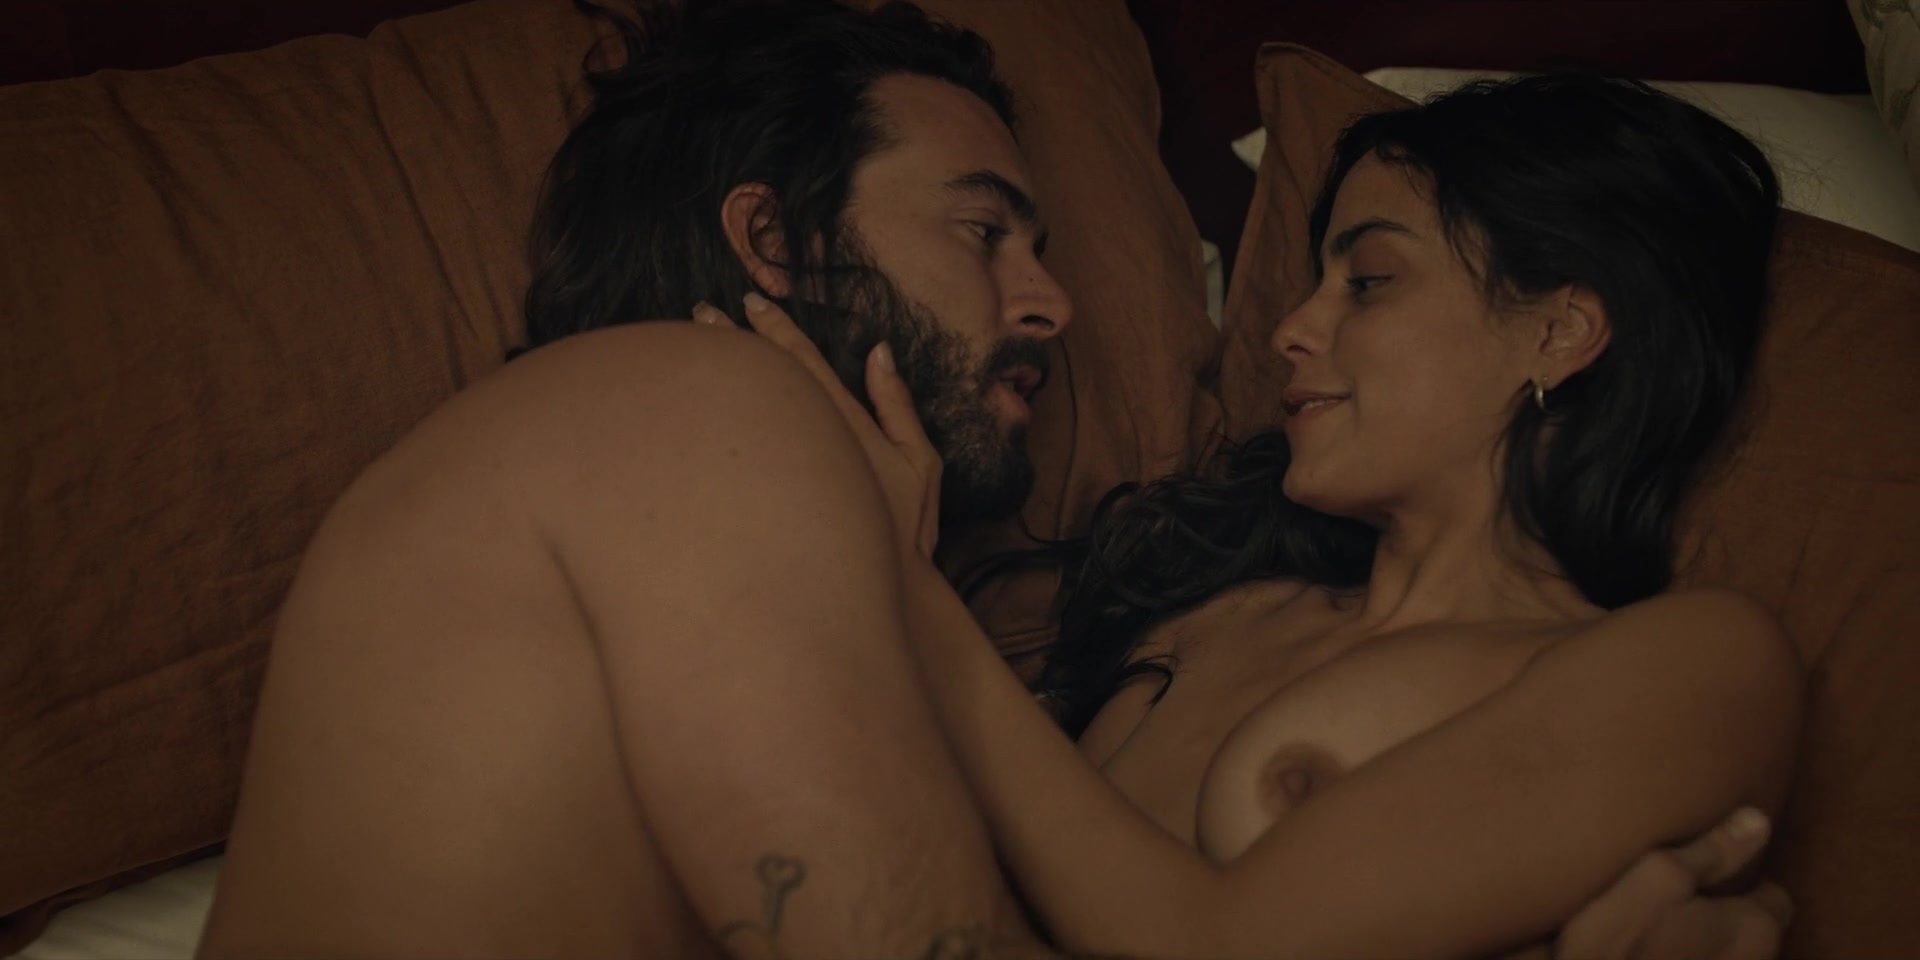 Anastasia Baranova Naked paola fernandez nude - yankee s01e18e23 (2019) video » best